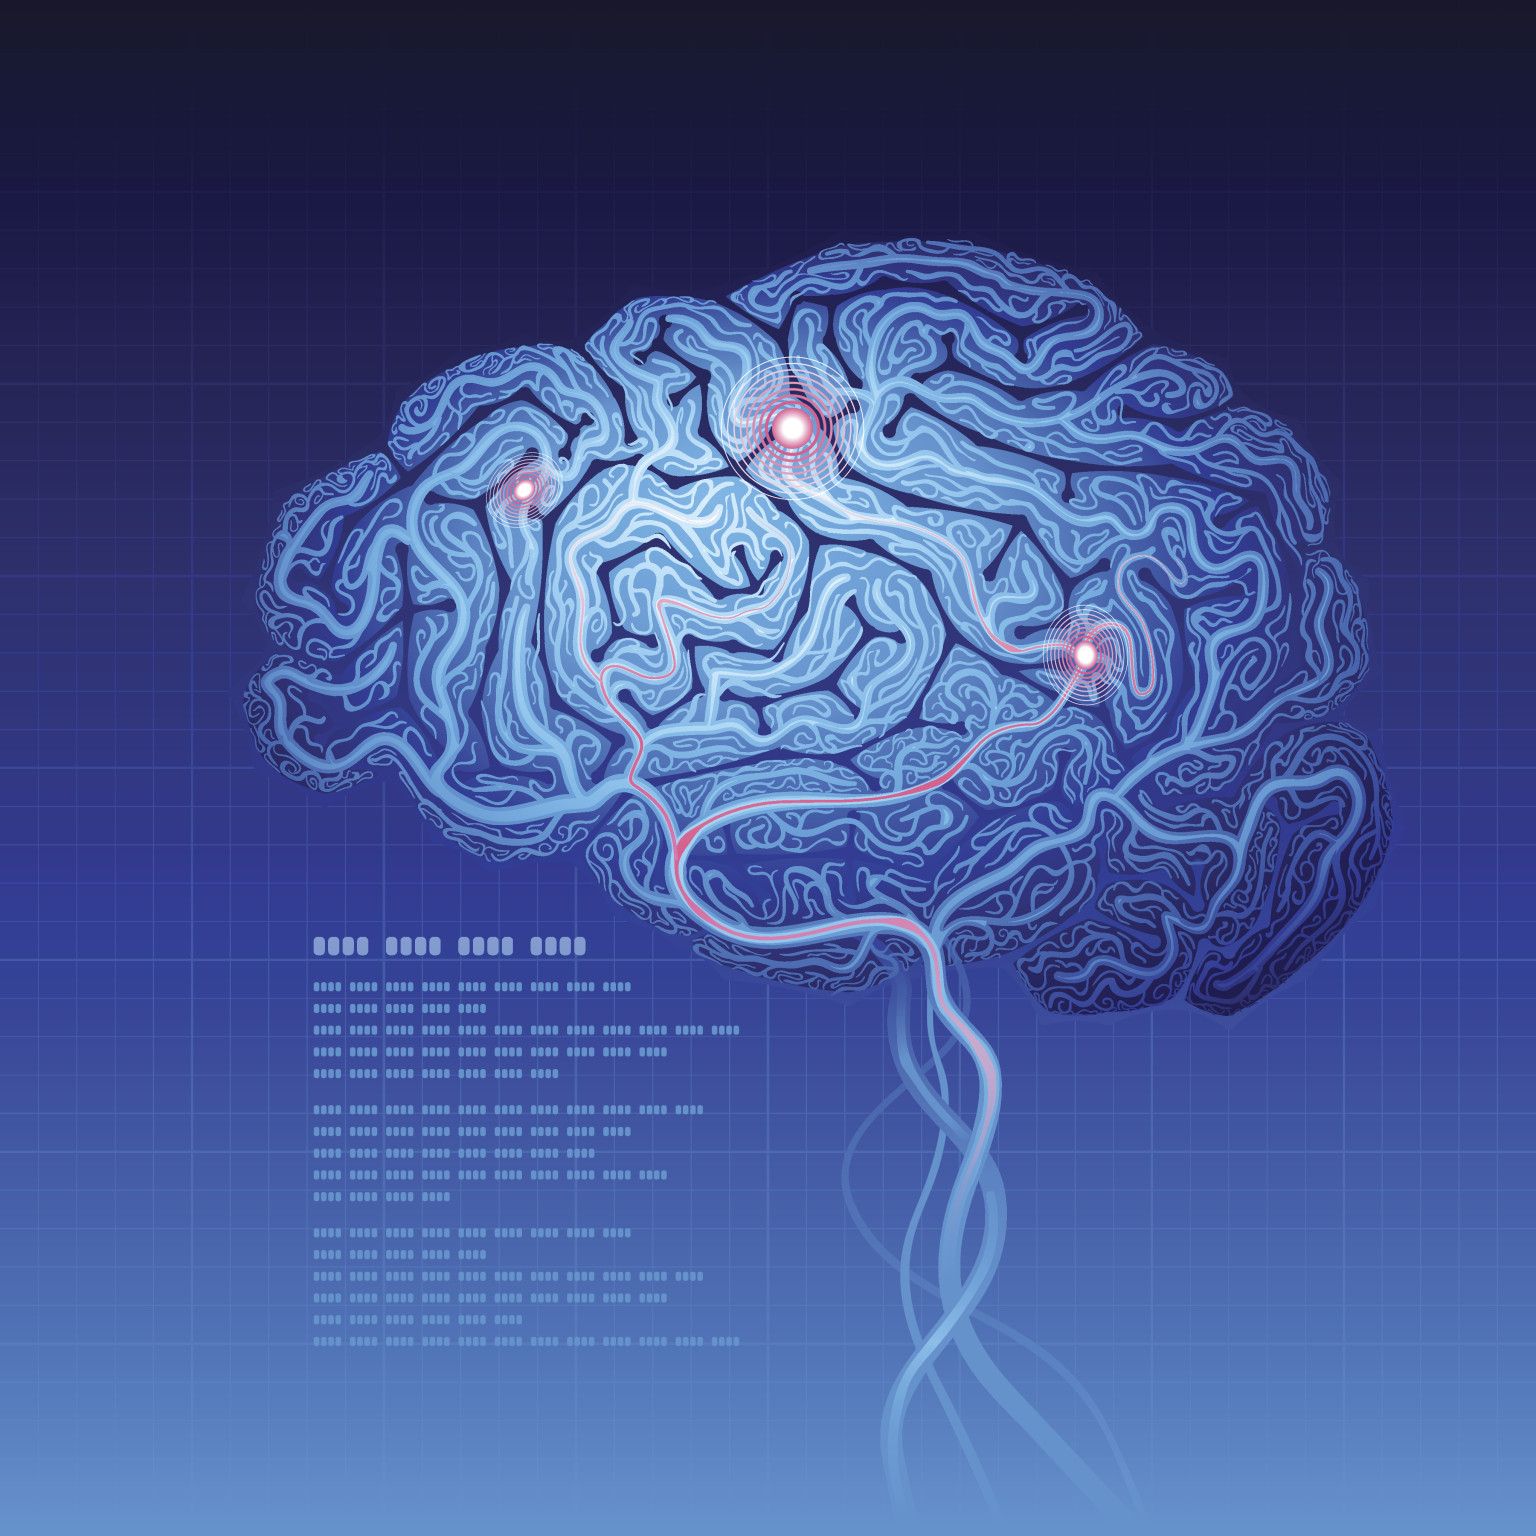 3D Brain Map New BigBrain Atlas Called Most Detailed